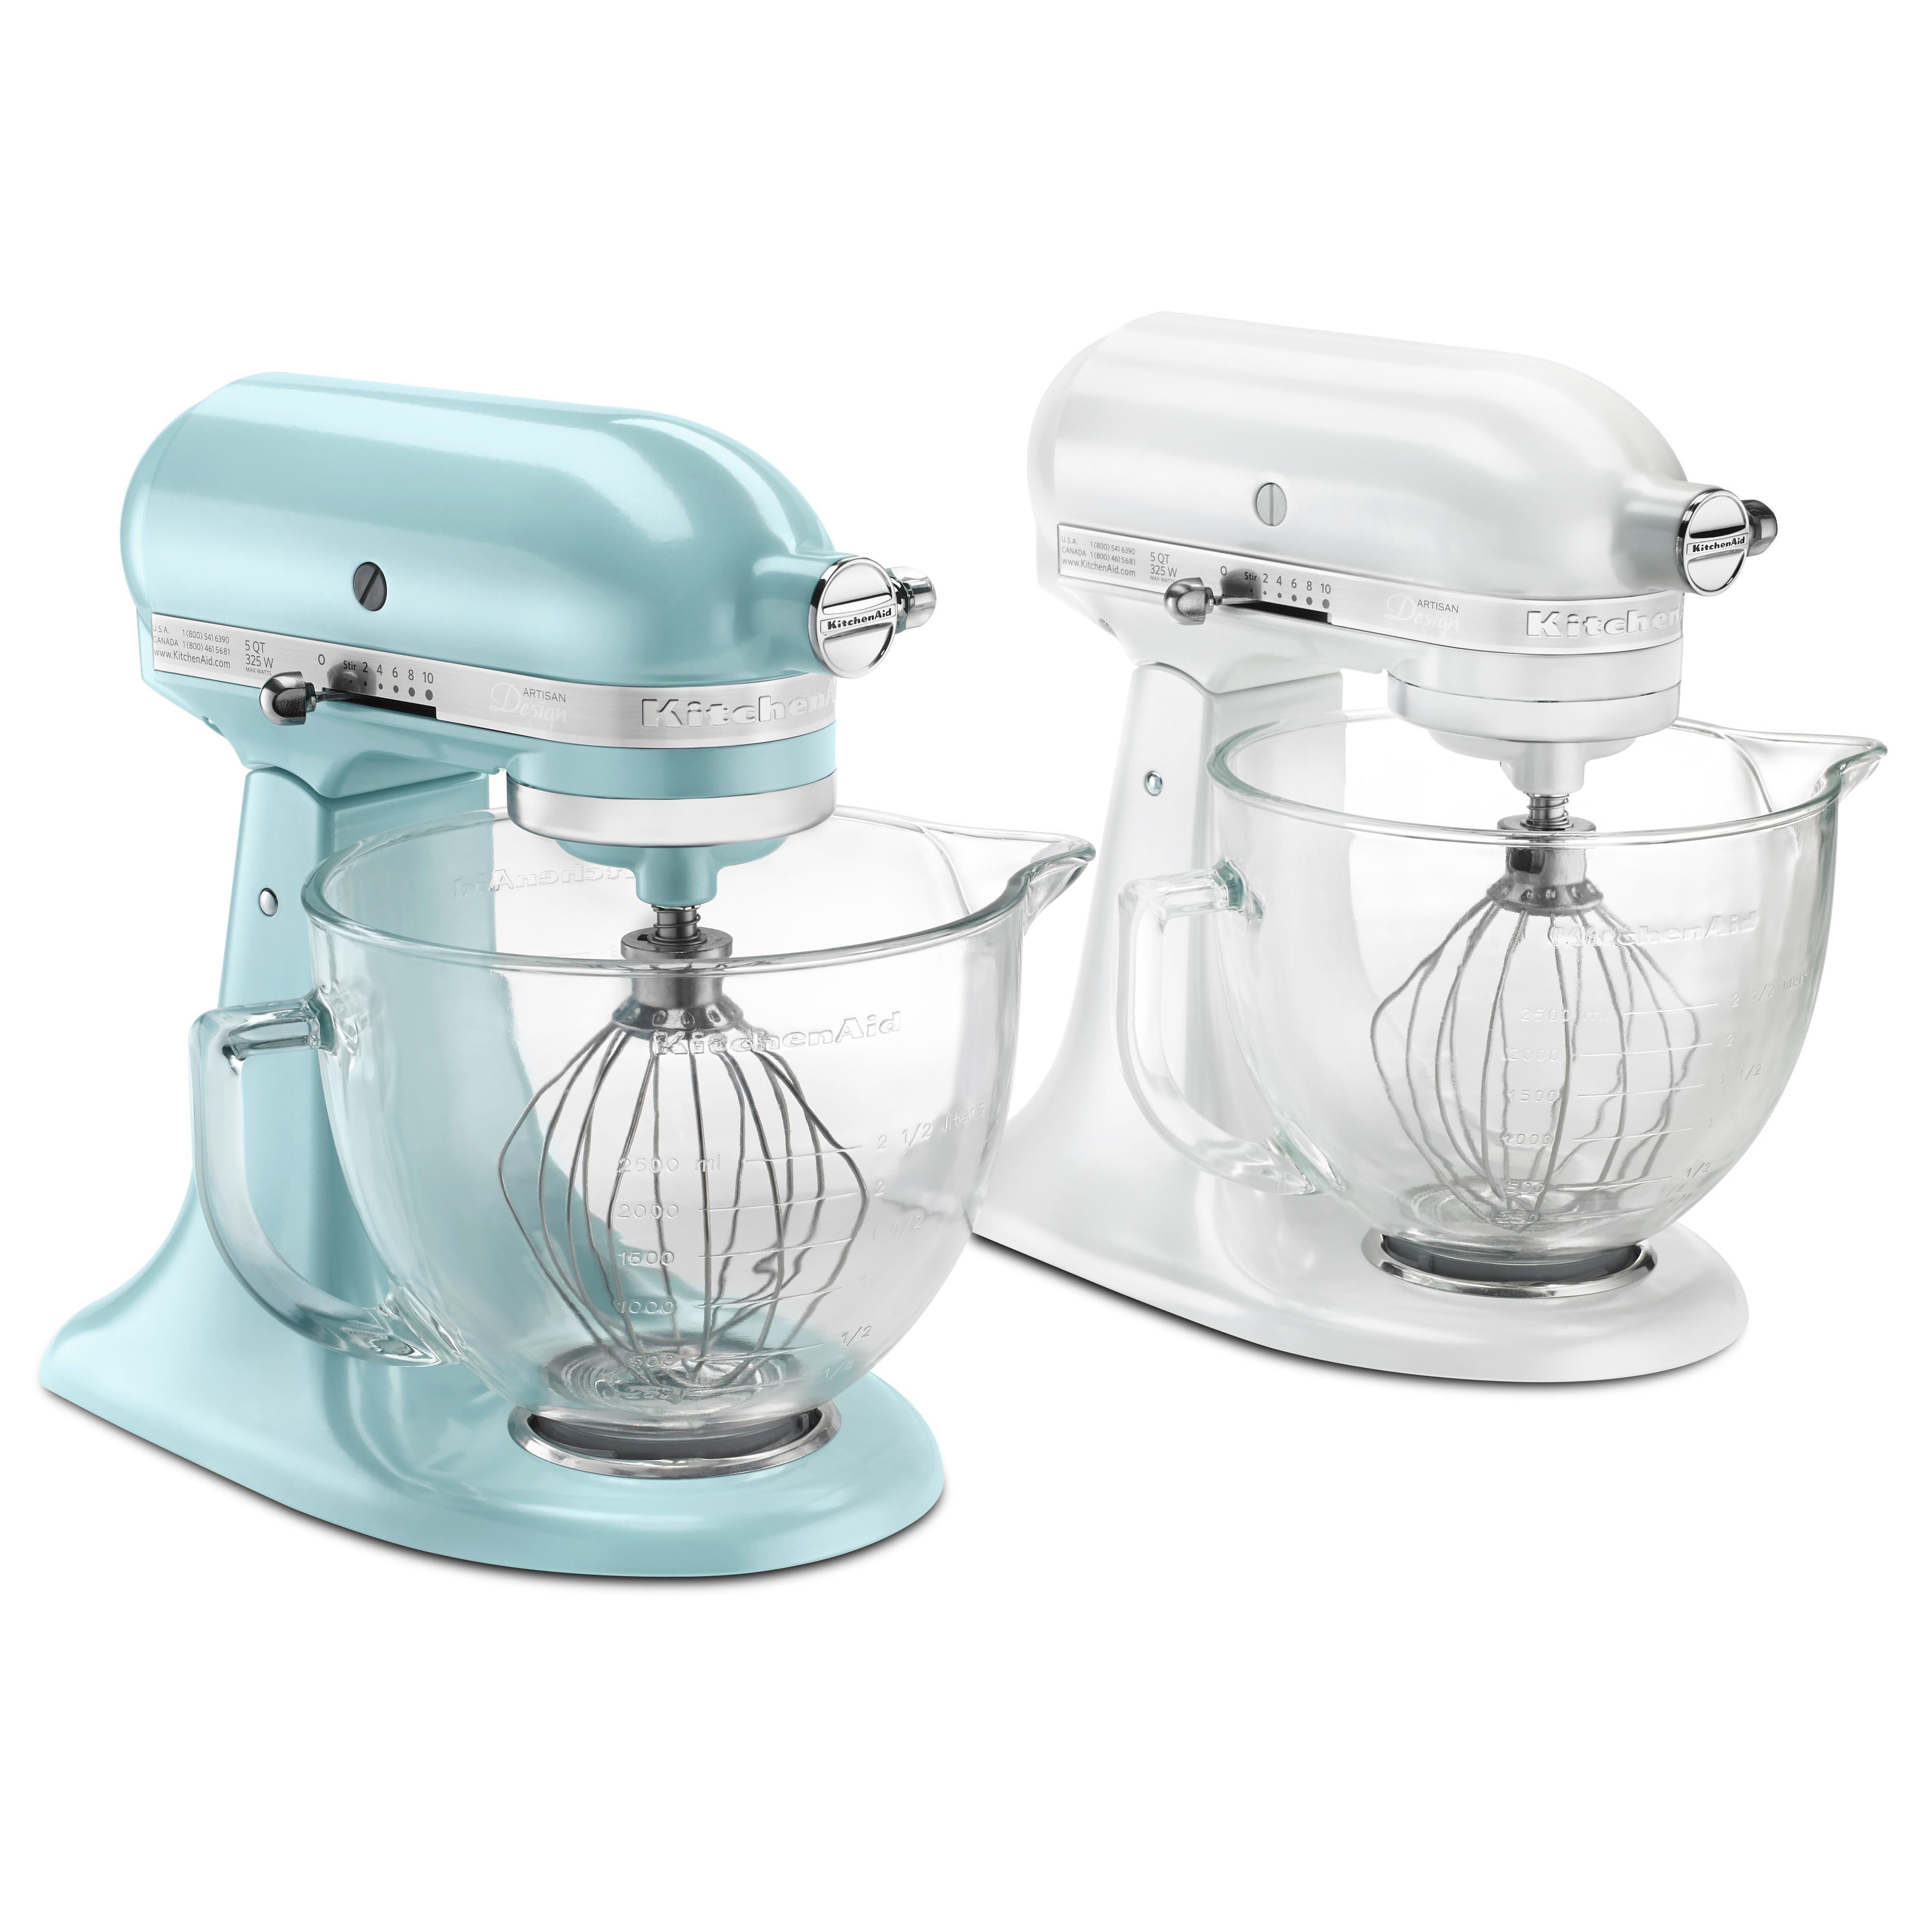 Designer Kitchen Aid Mixers Kitchenaid Ksm155gbeb Artisan Designer Series Mixer Amazonca